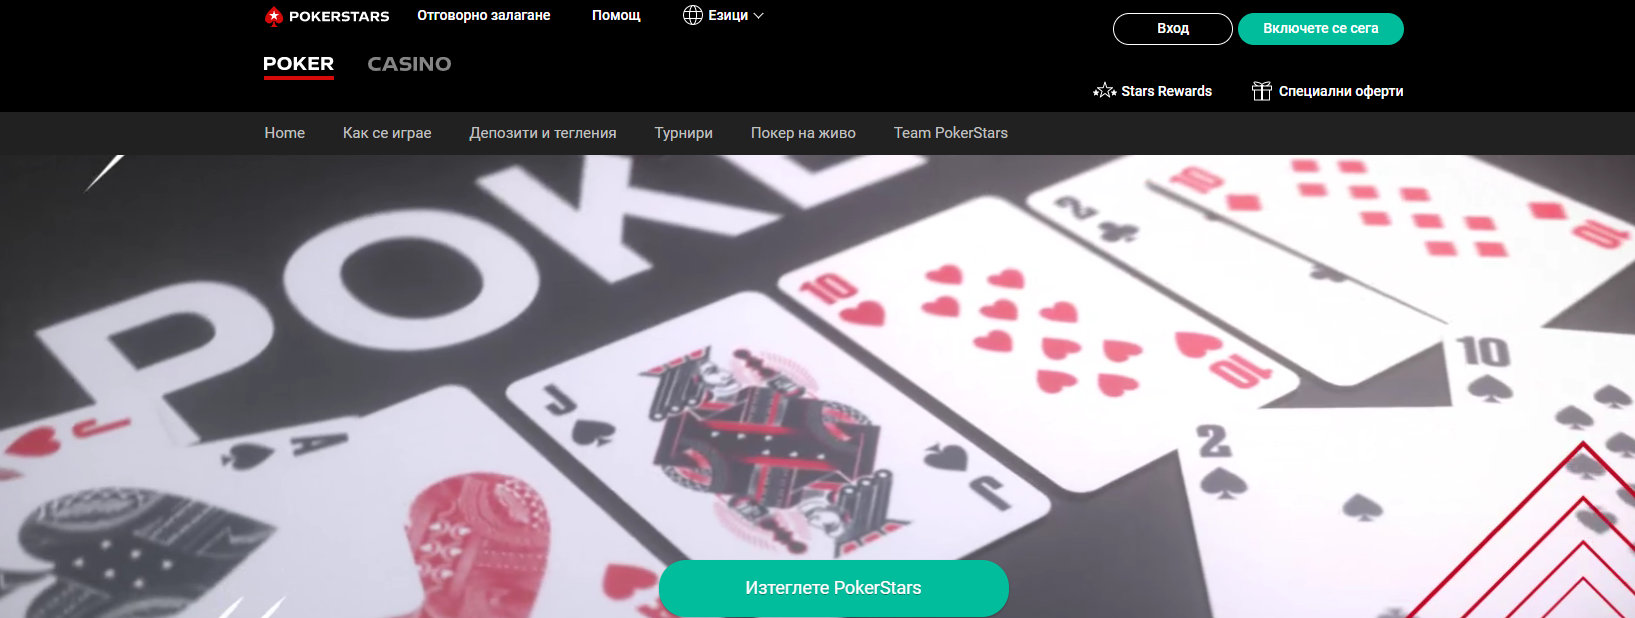 izteglete sega pokerstars-komarbet.com